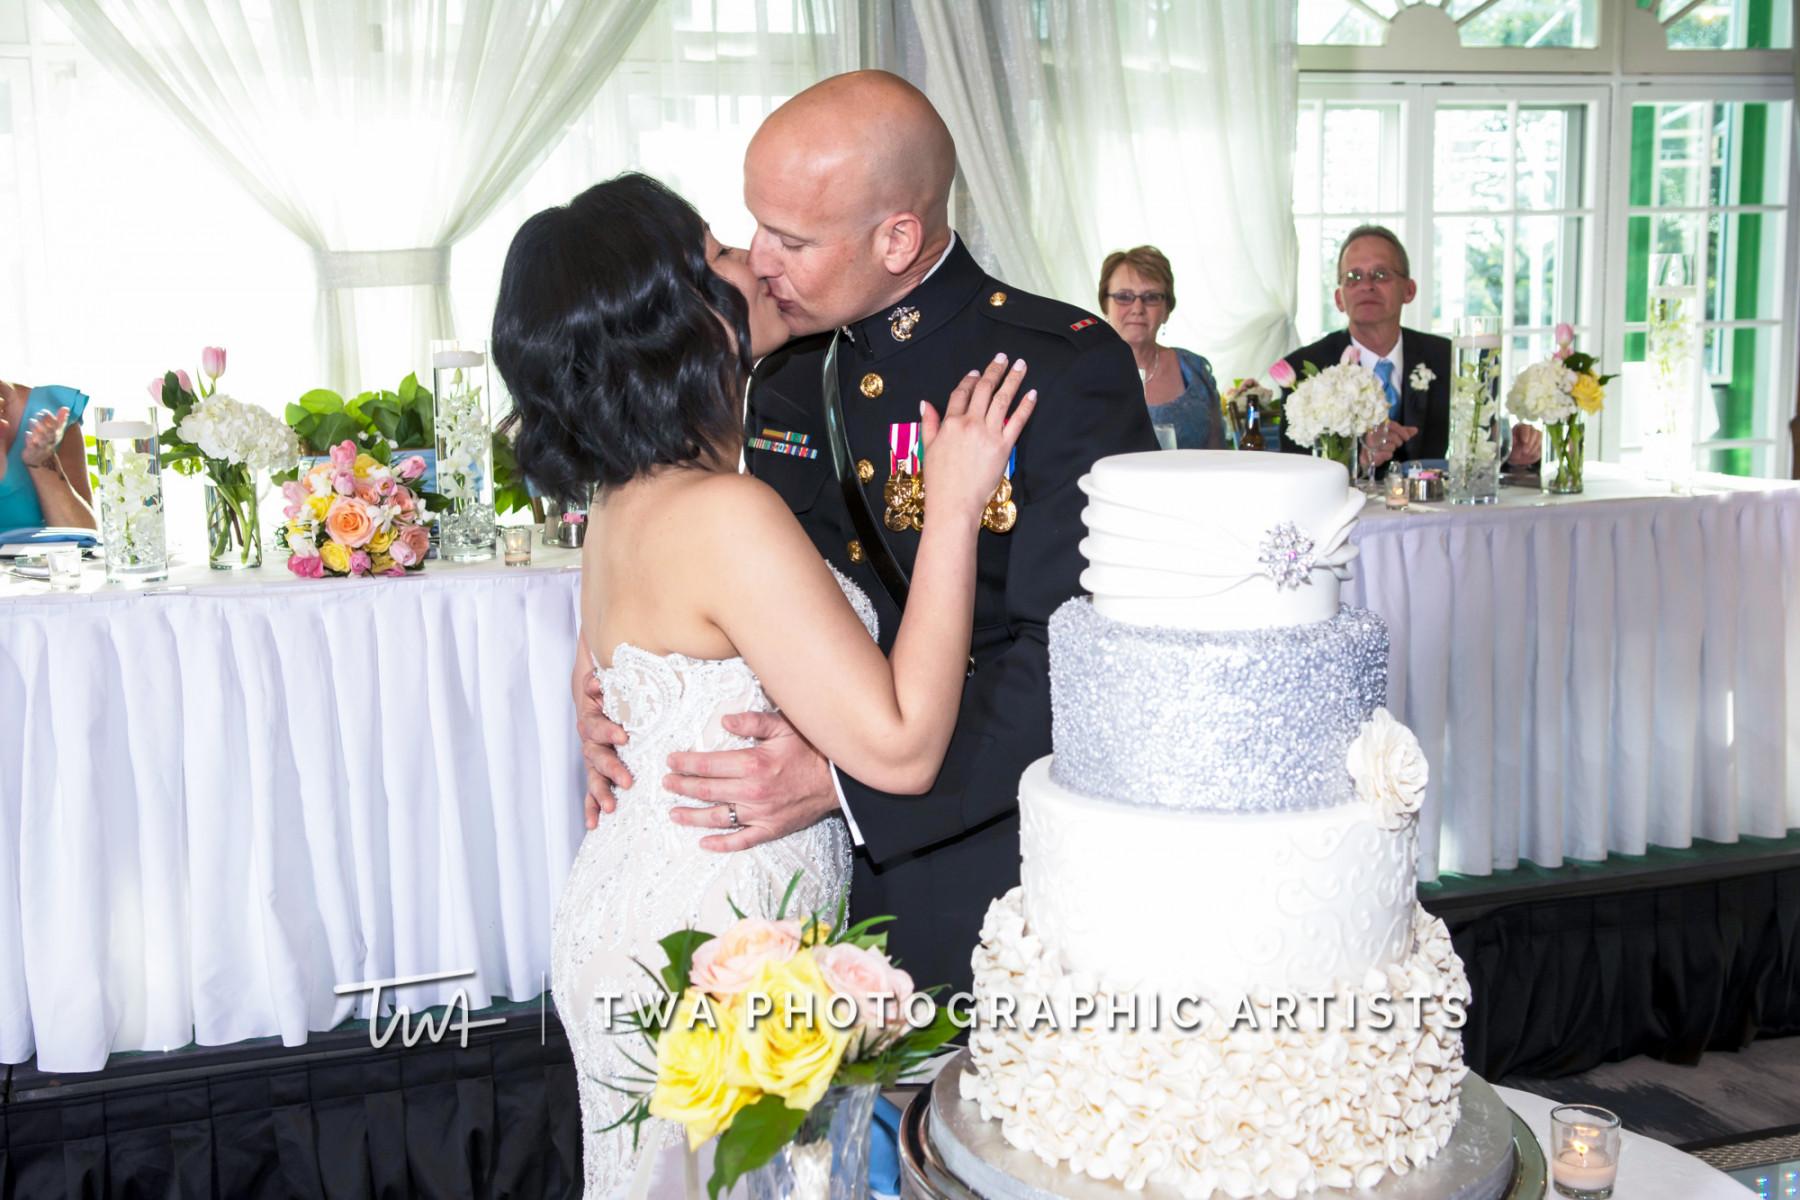 Chicago-Wedding-Photographer-TWA-Photographic-Artists-Drake-Hotel_Bermas_Zweifel_JP_GP-0649